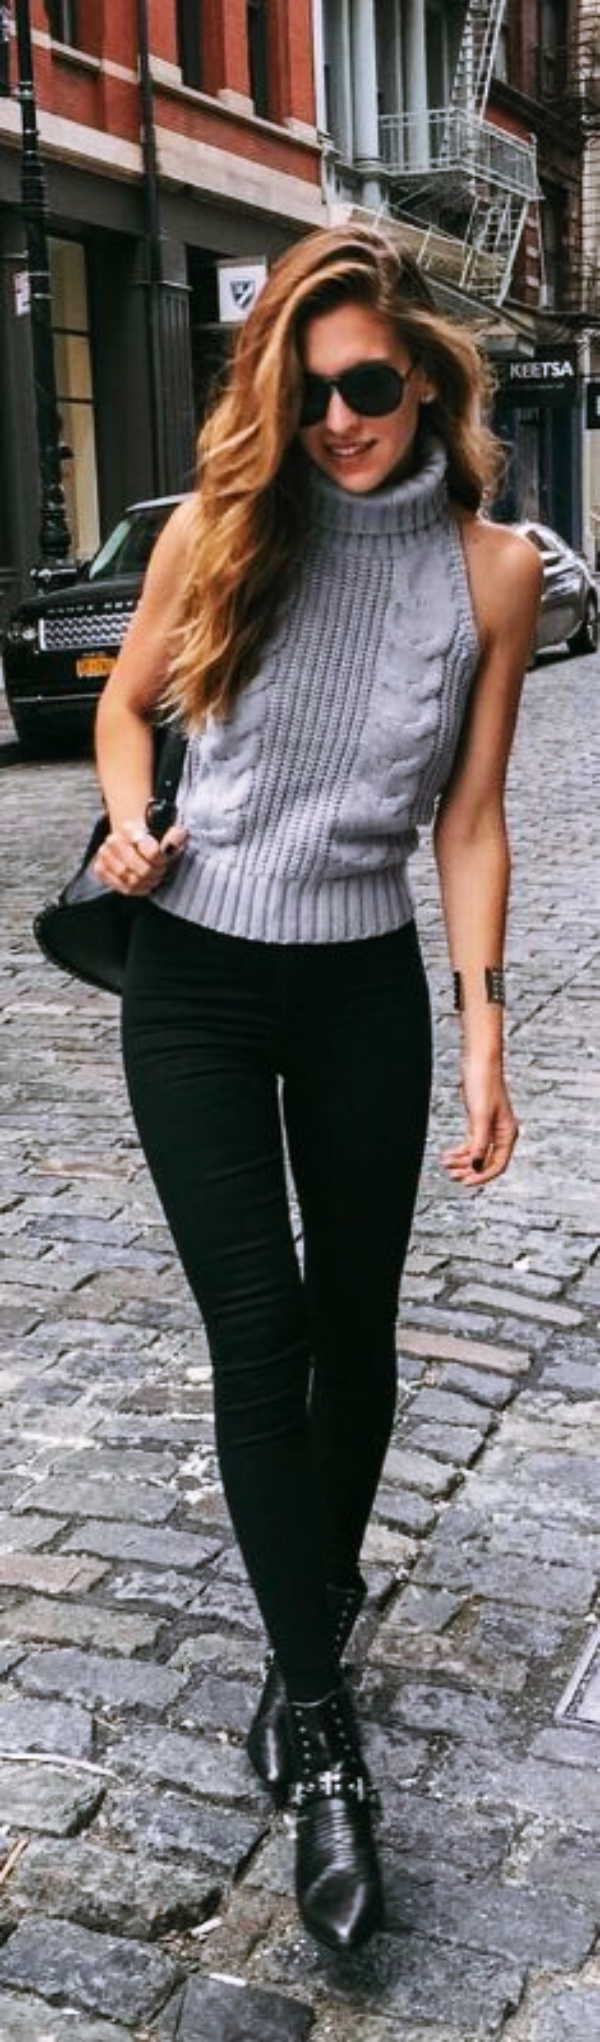 Preppy-Fashion-Outfits-6